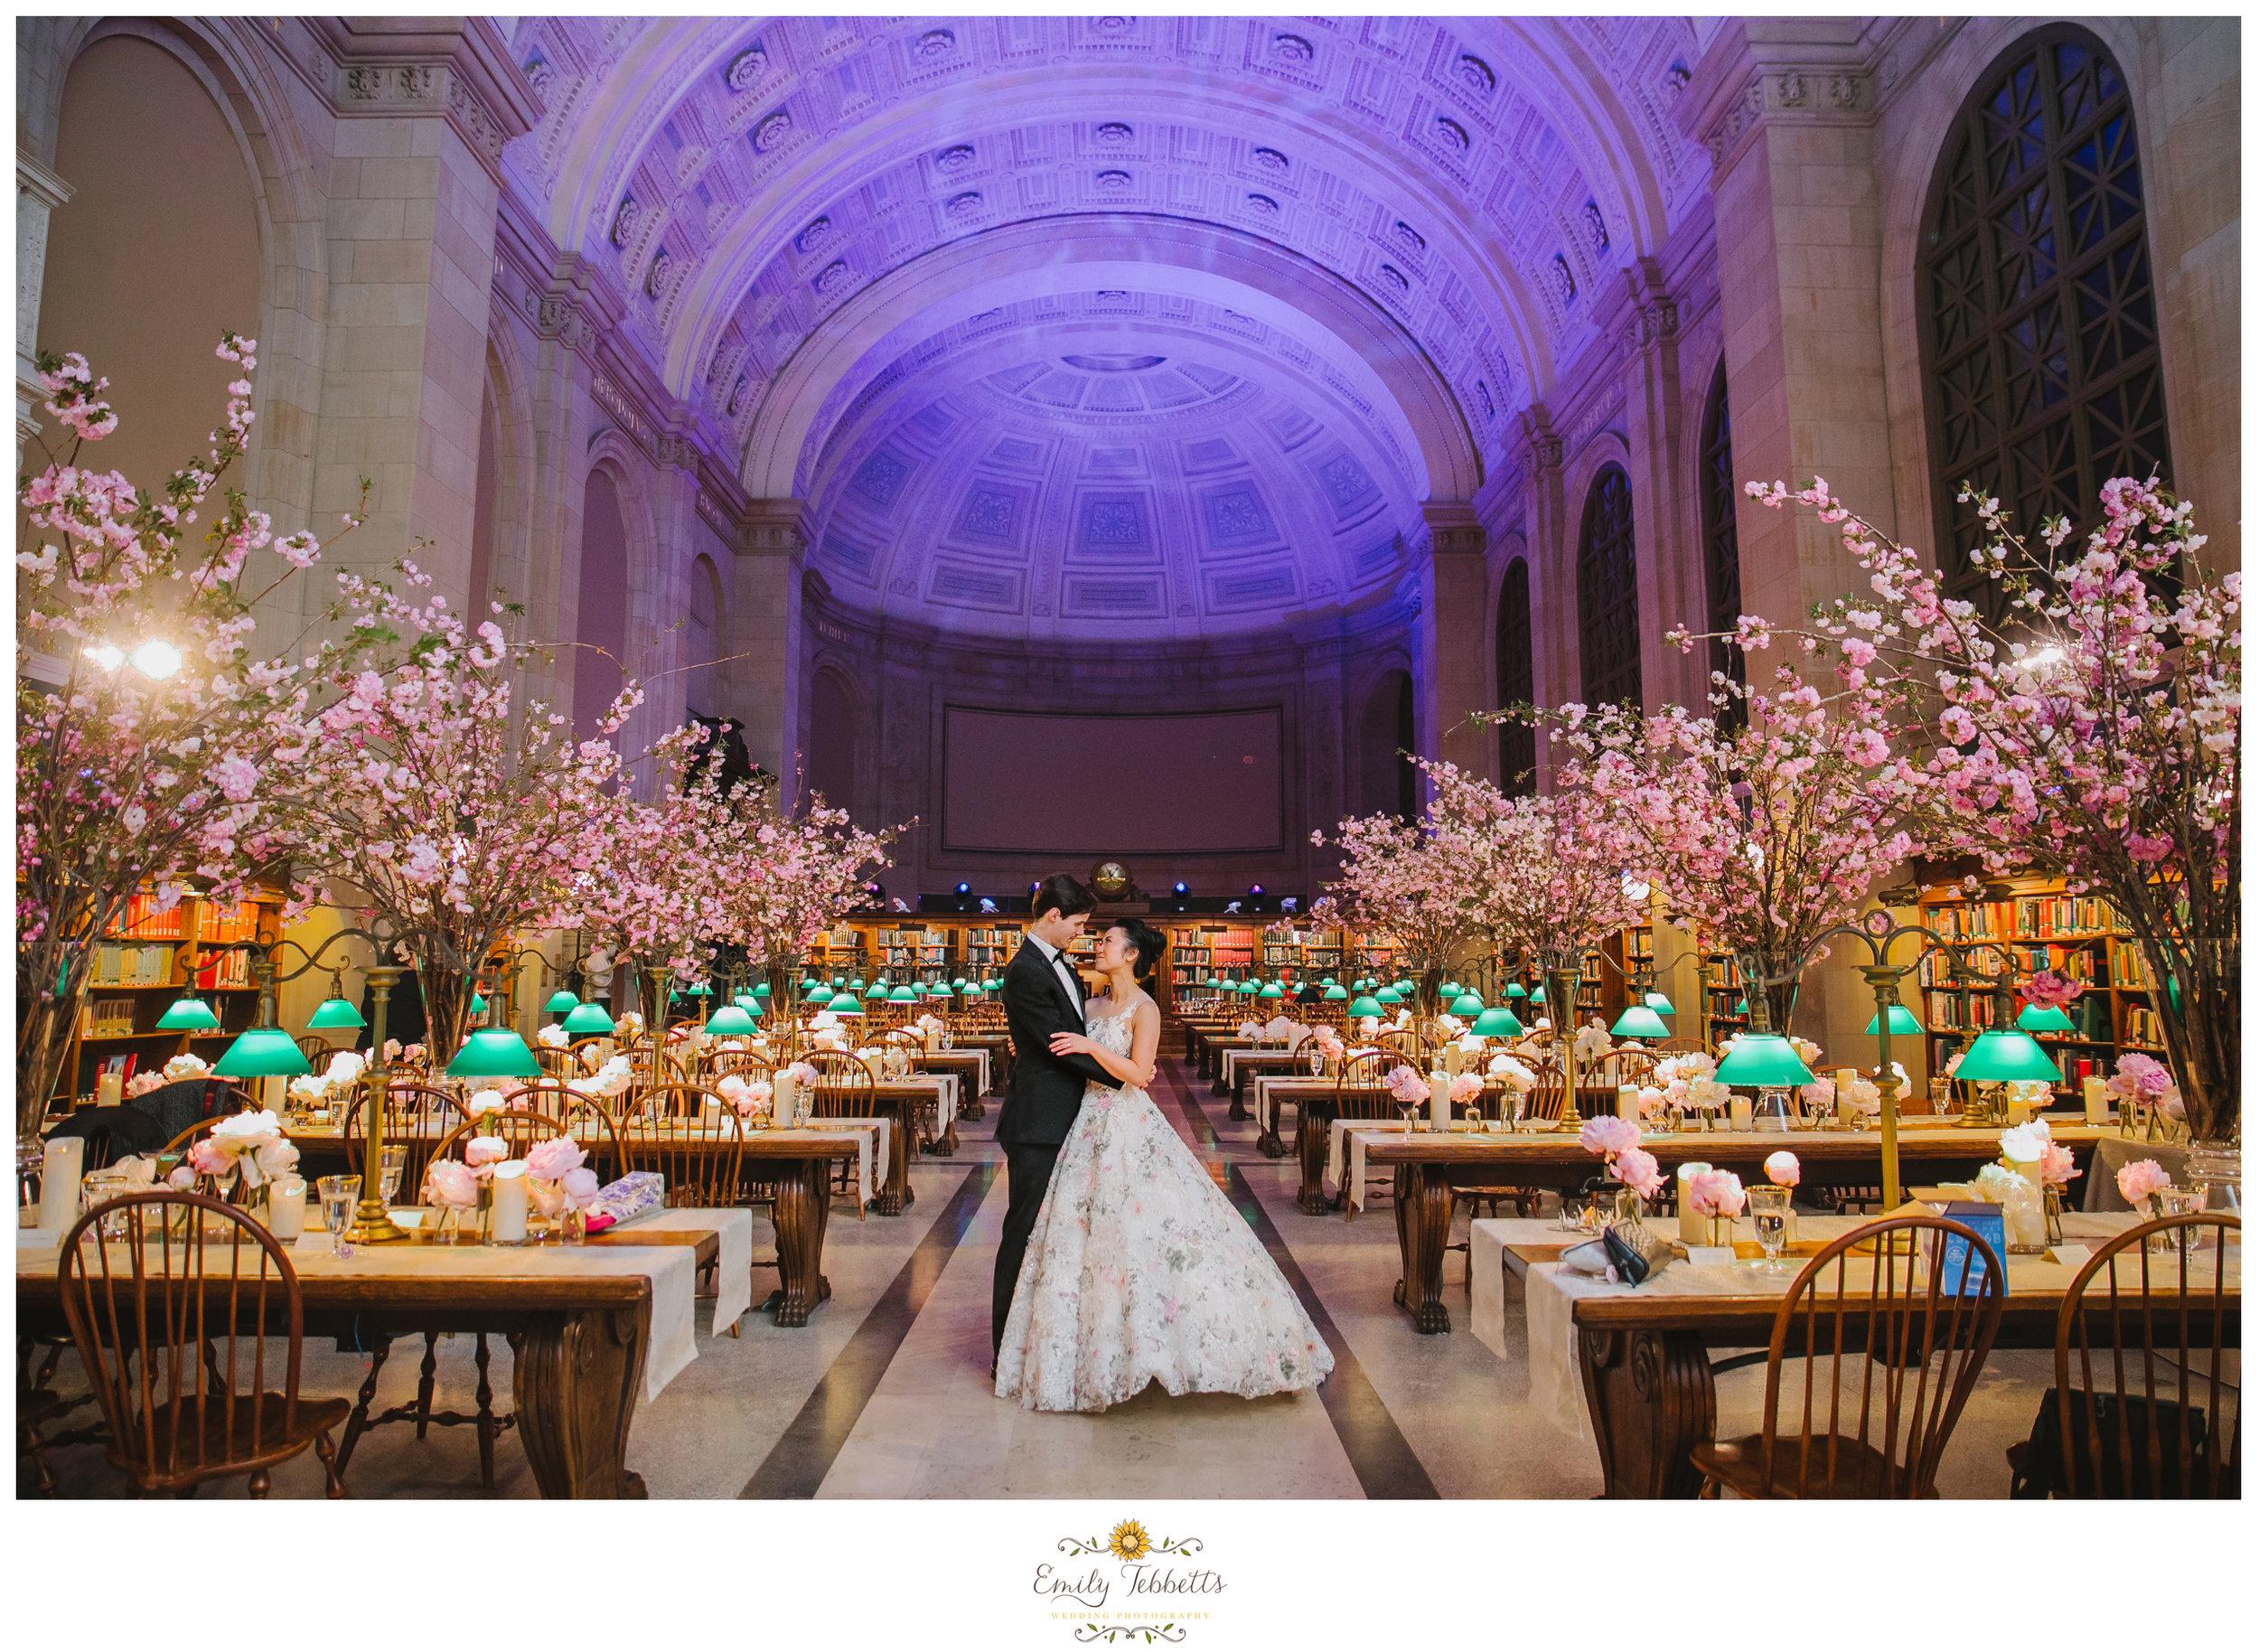 Boston Public Library BPL Wedding Emily Tebbetts Photography - Kaori + John-11.jpg